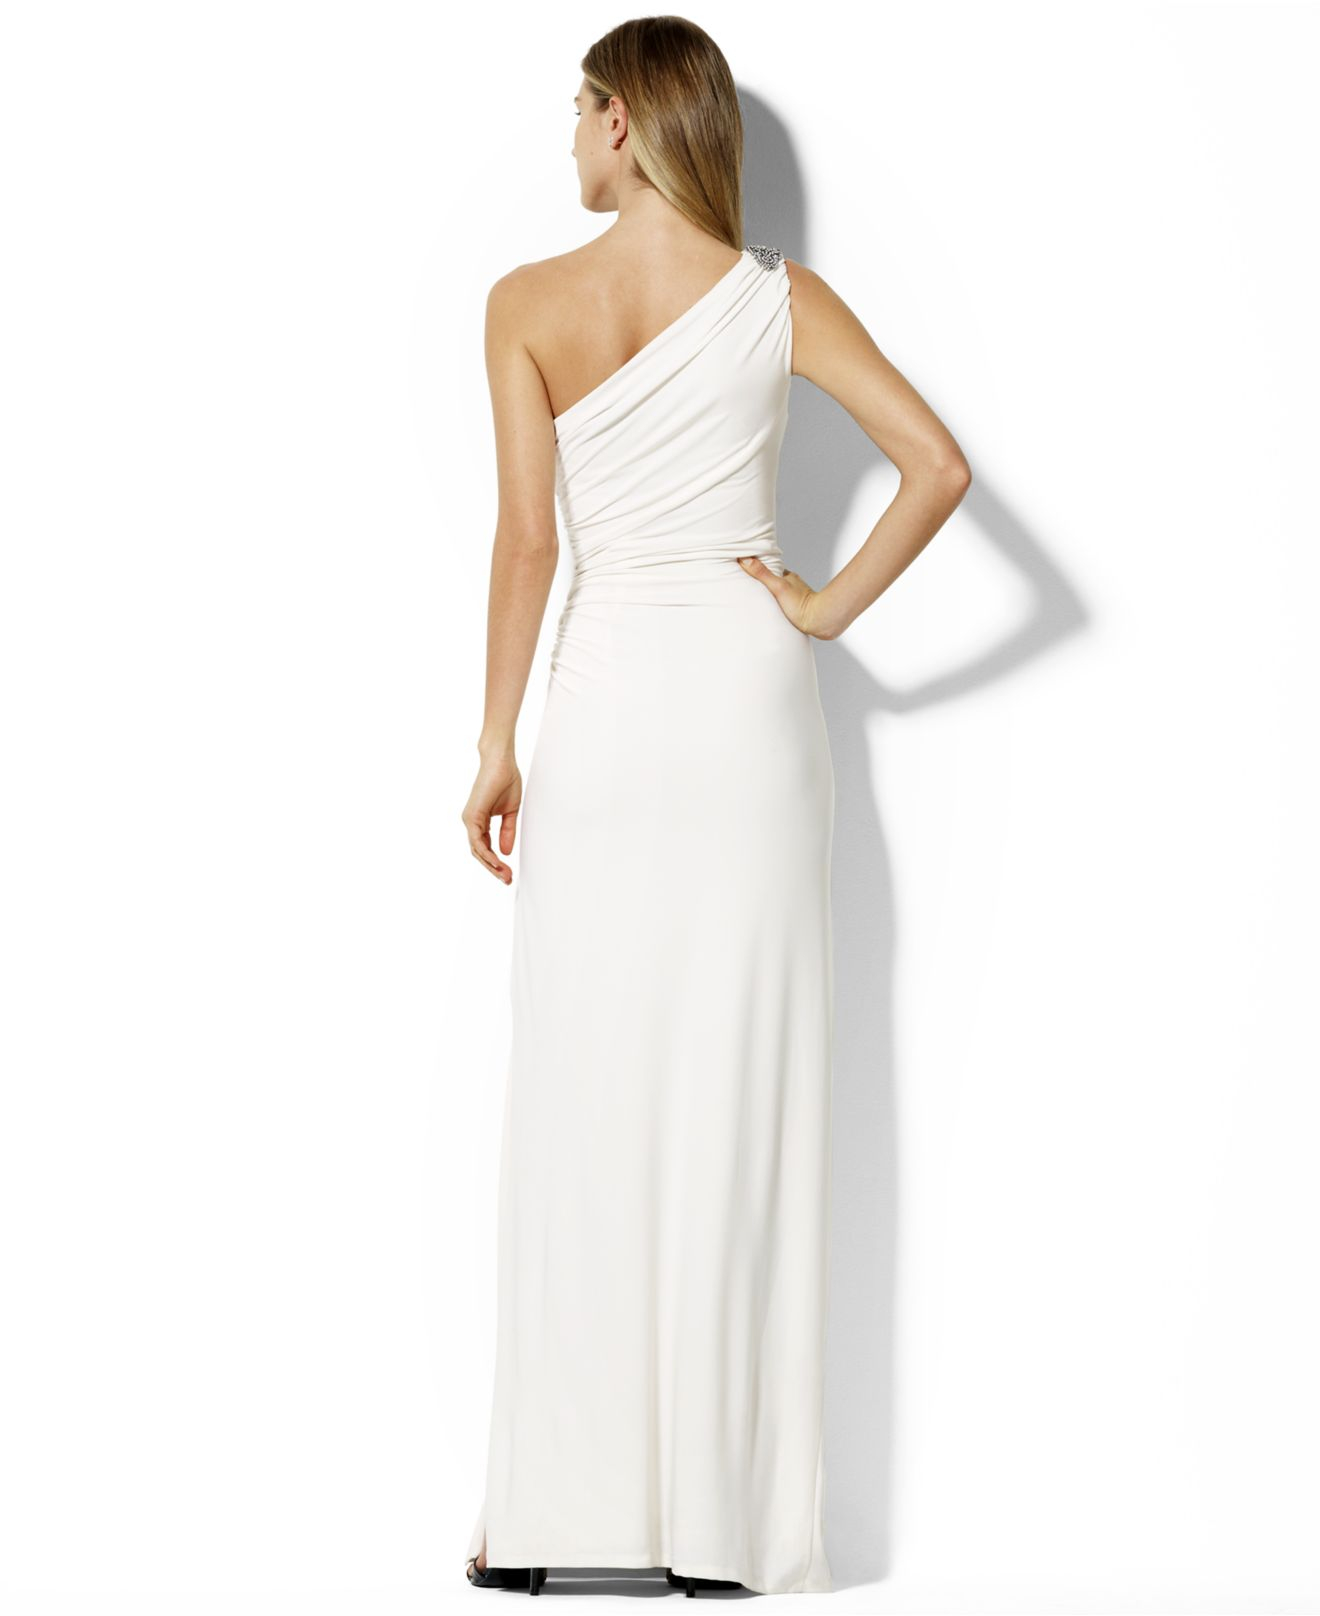 Lyst - Lauren By Ralph Lauren One-Shoulder Brooch Gown in White